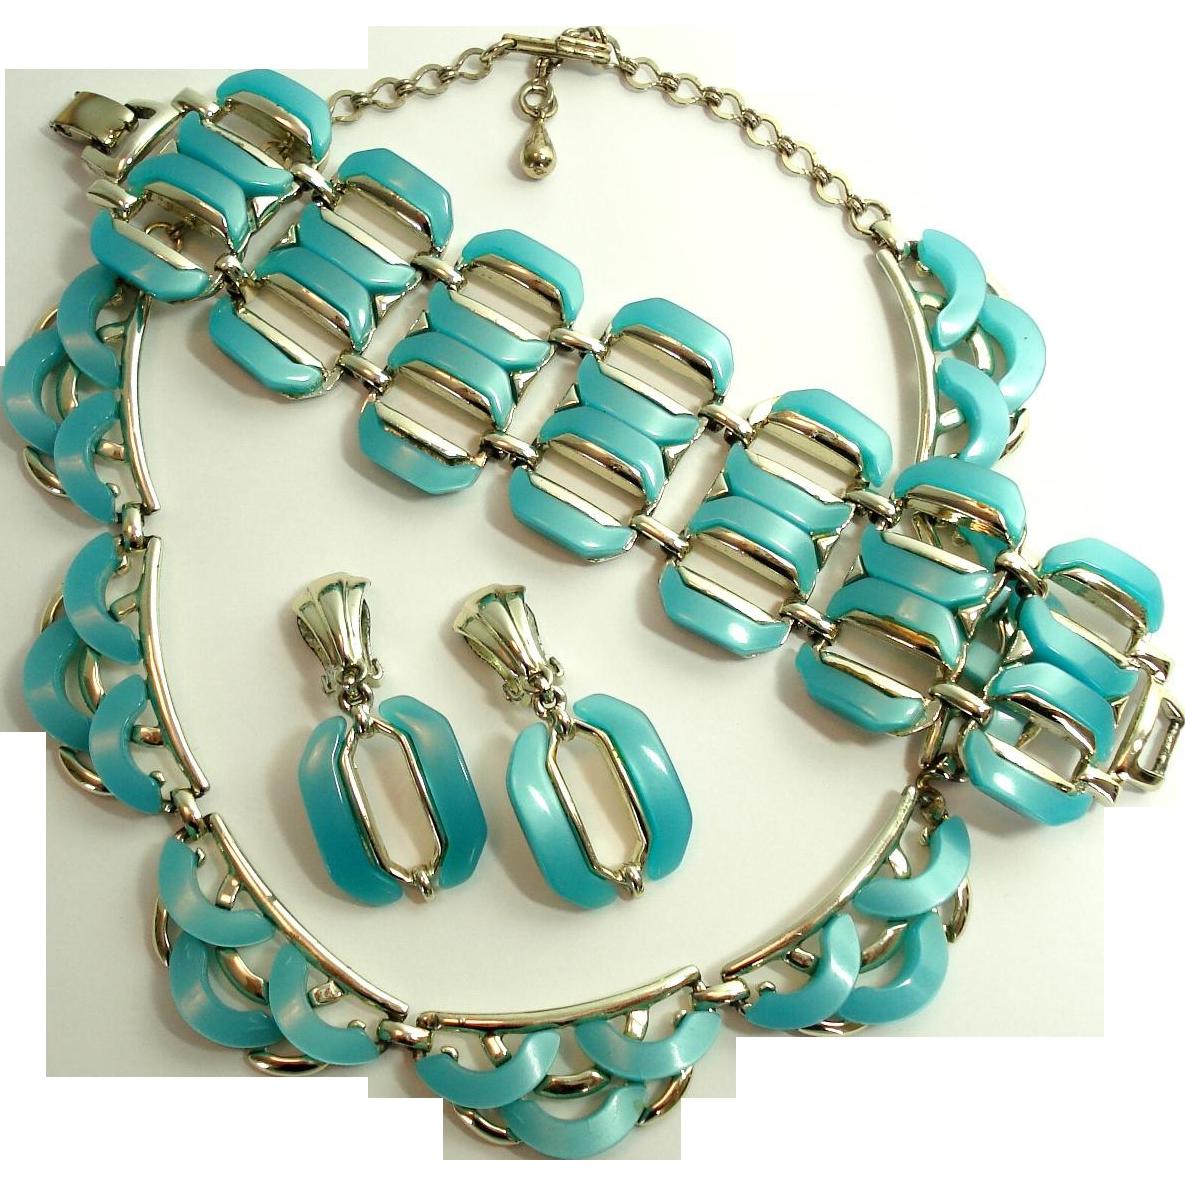 Aqua Moonglow Lucite Necklace Big Bracelet & Large Dangle Earrings Set